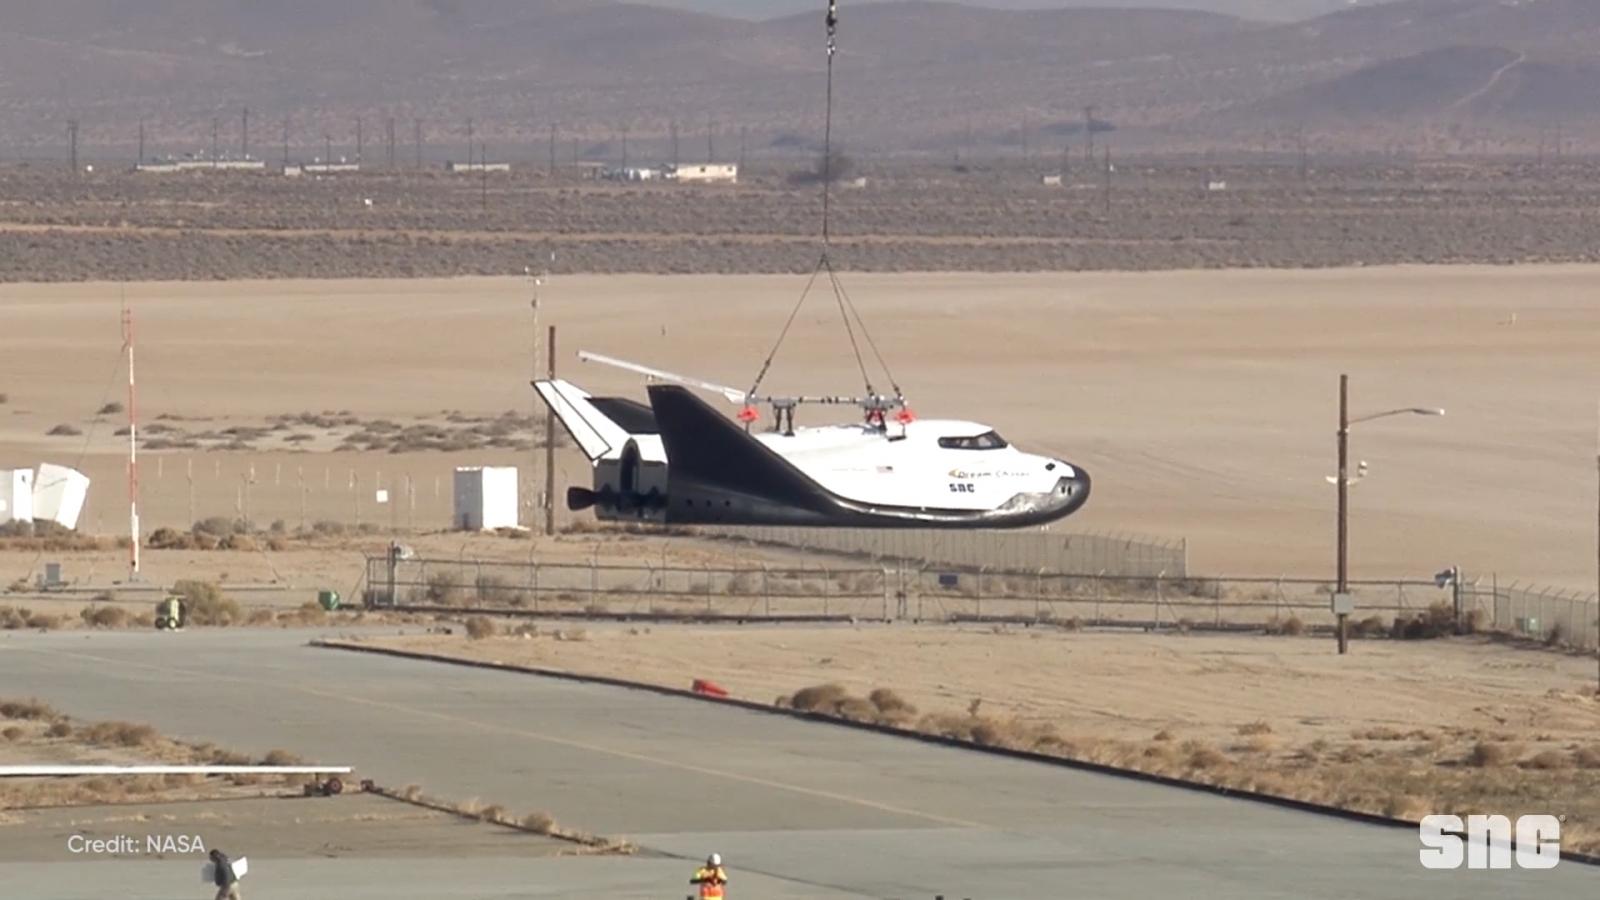 dream-chaser-spacecraft-has-first-successful-test-flight